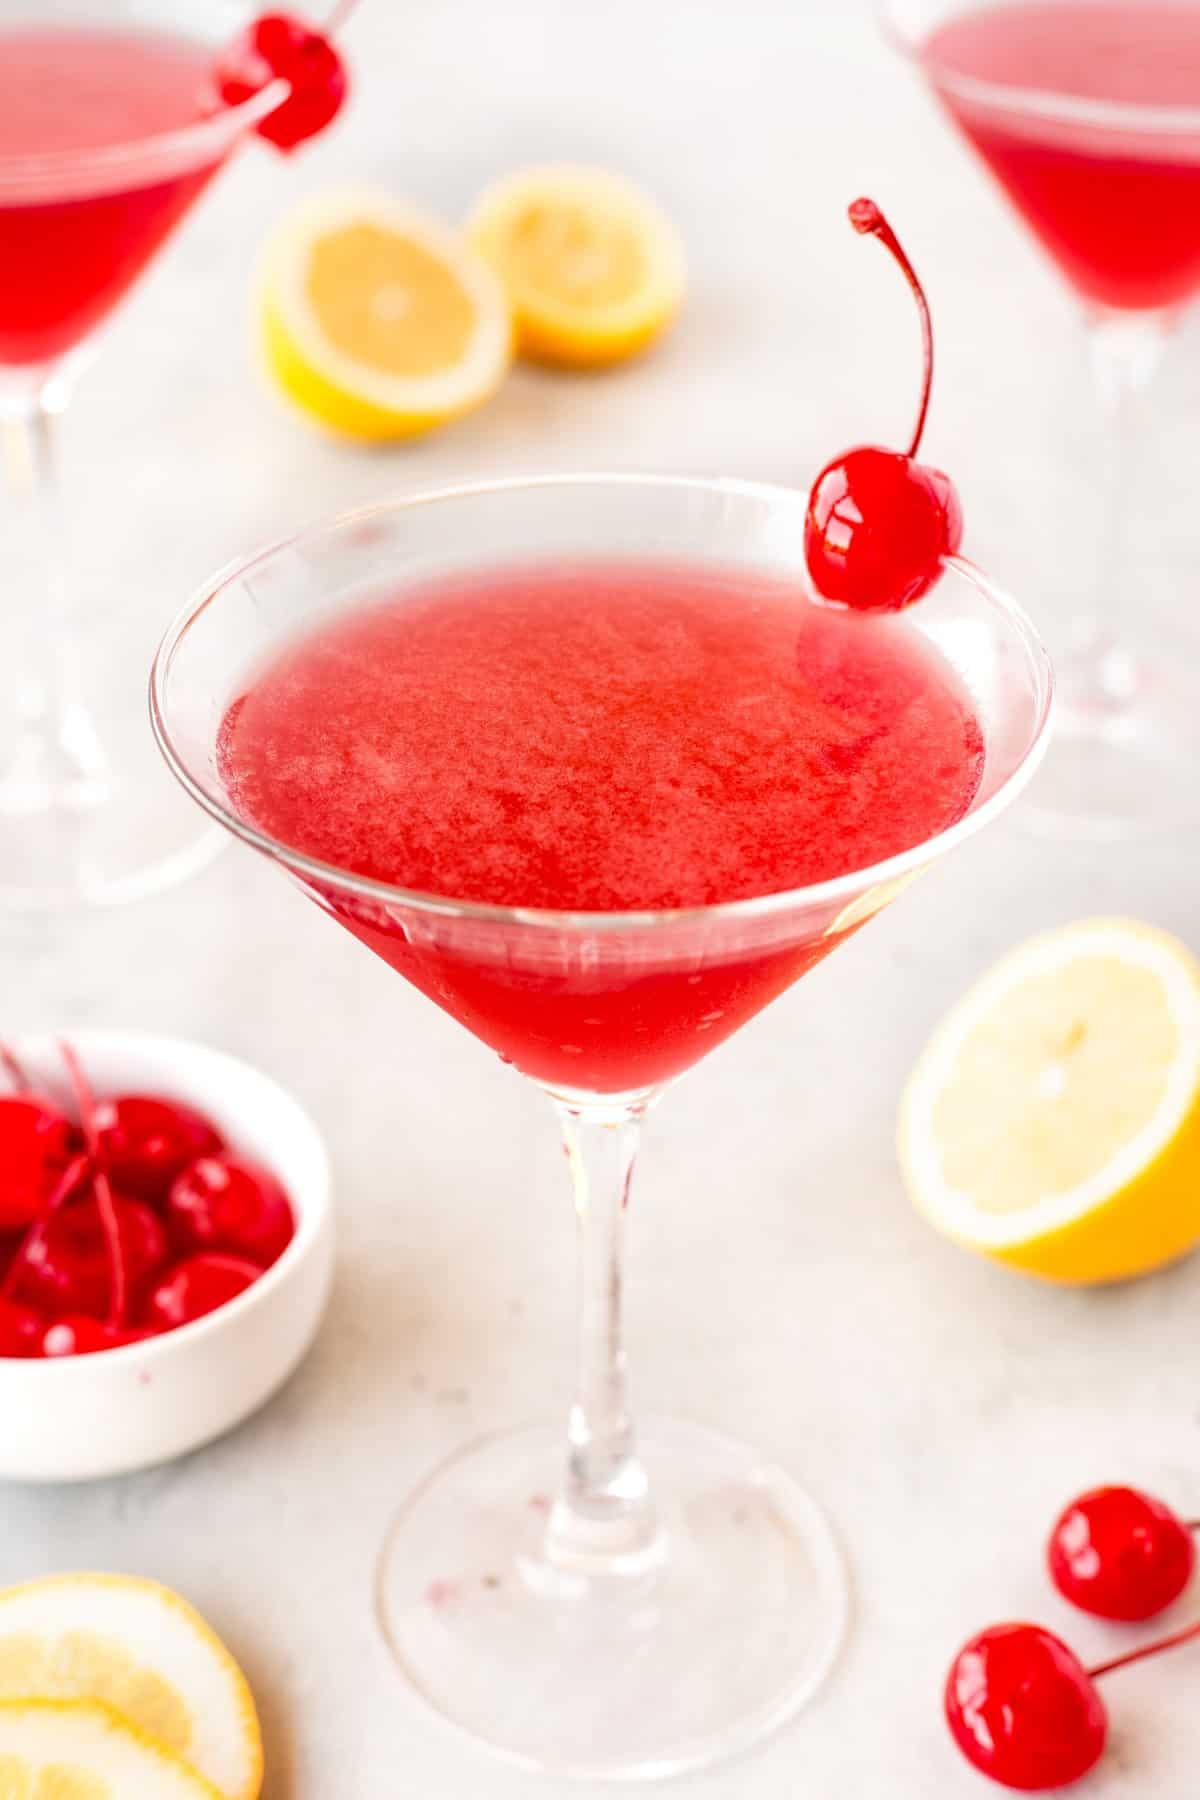 Showing one martini with maraschino cherries and lemon slices